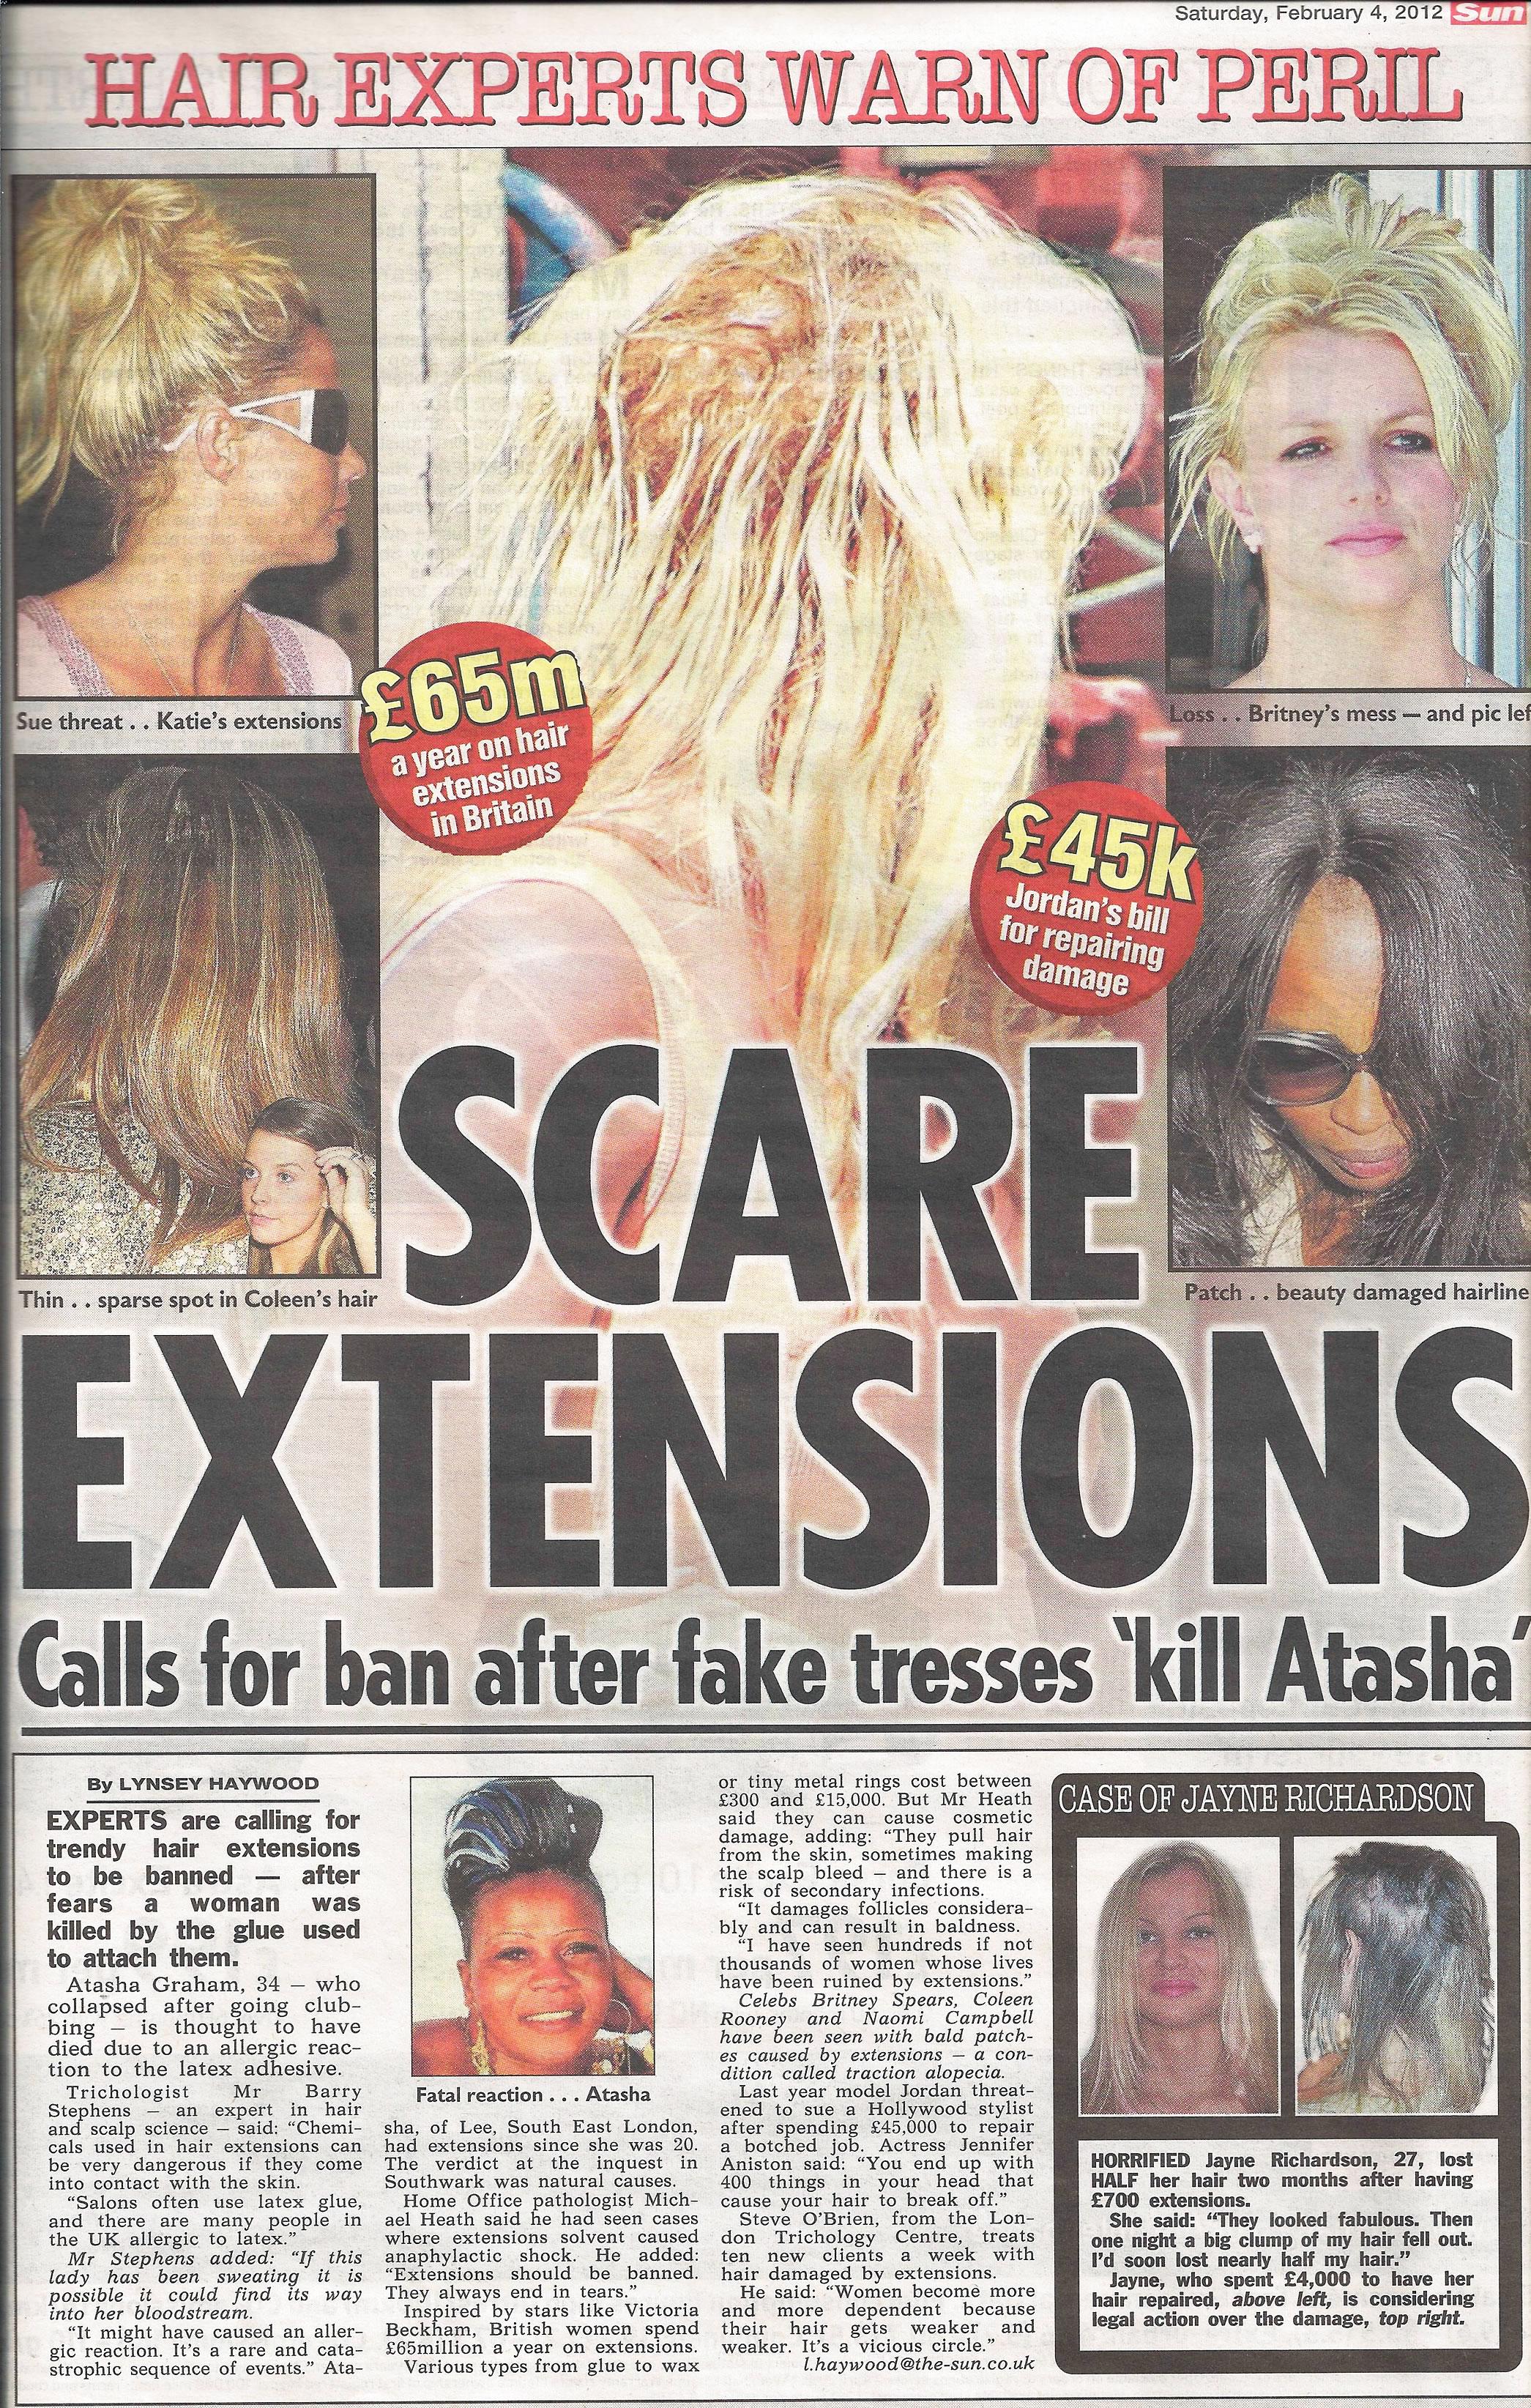 'Scare Extensions - Calls for ban after fake tresses 'kill Atasha'' - The Sun